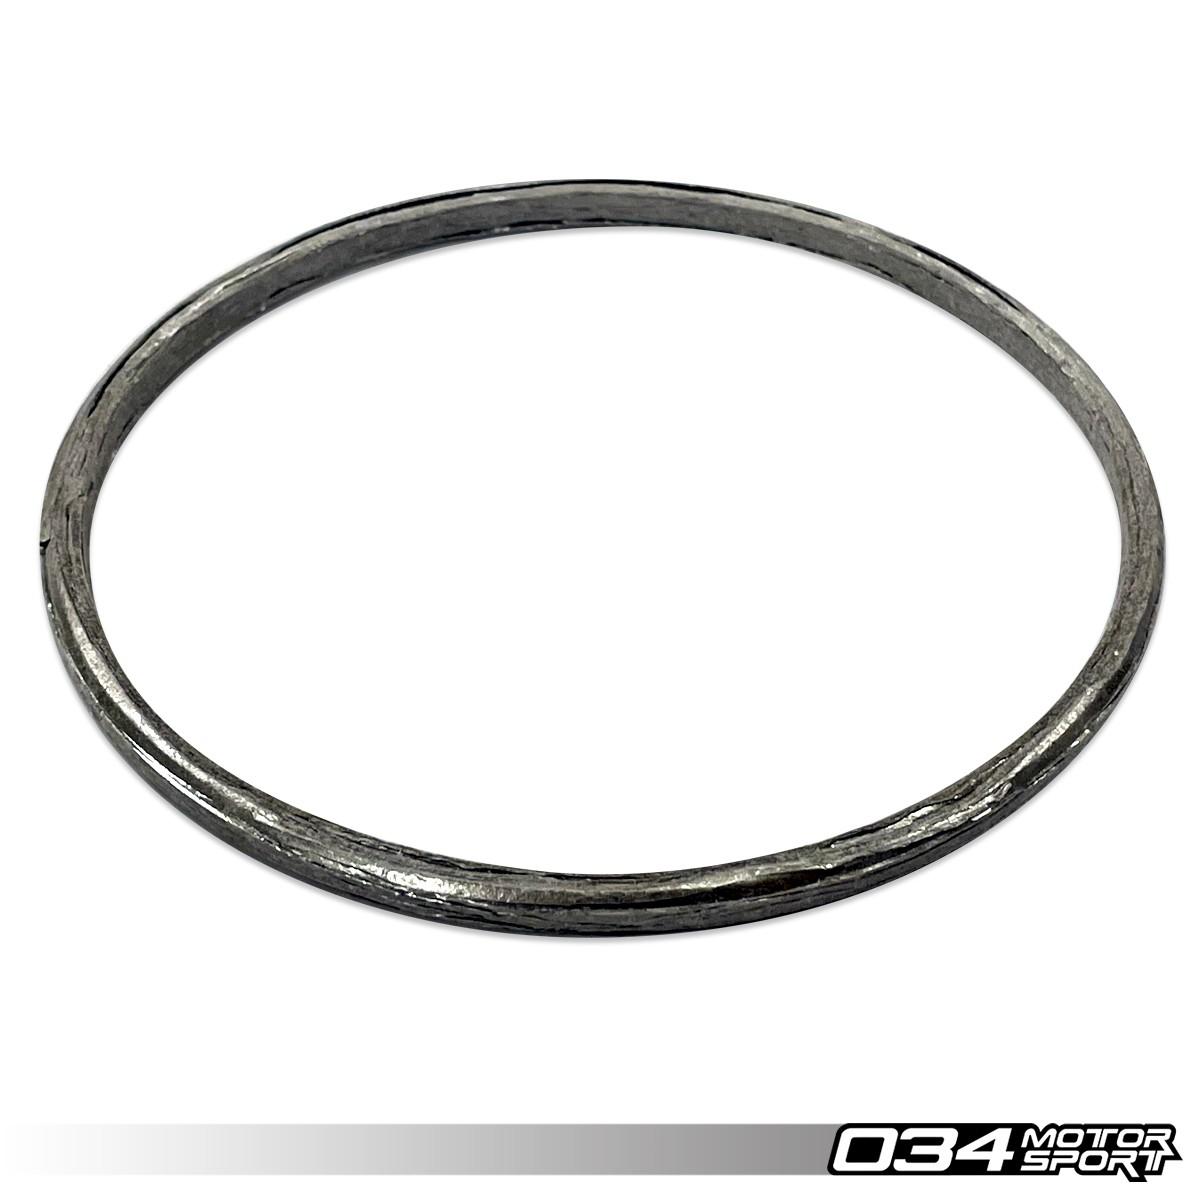 Gasket, V-band, B9 RS5 VAG-8W0253115